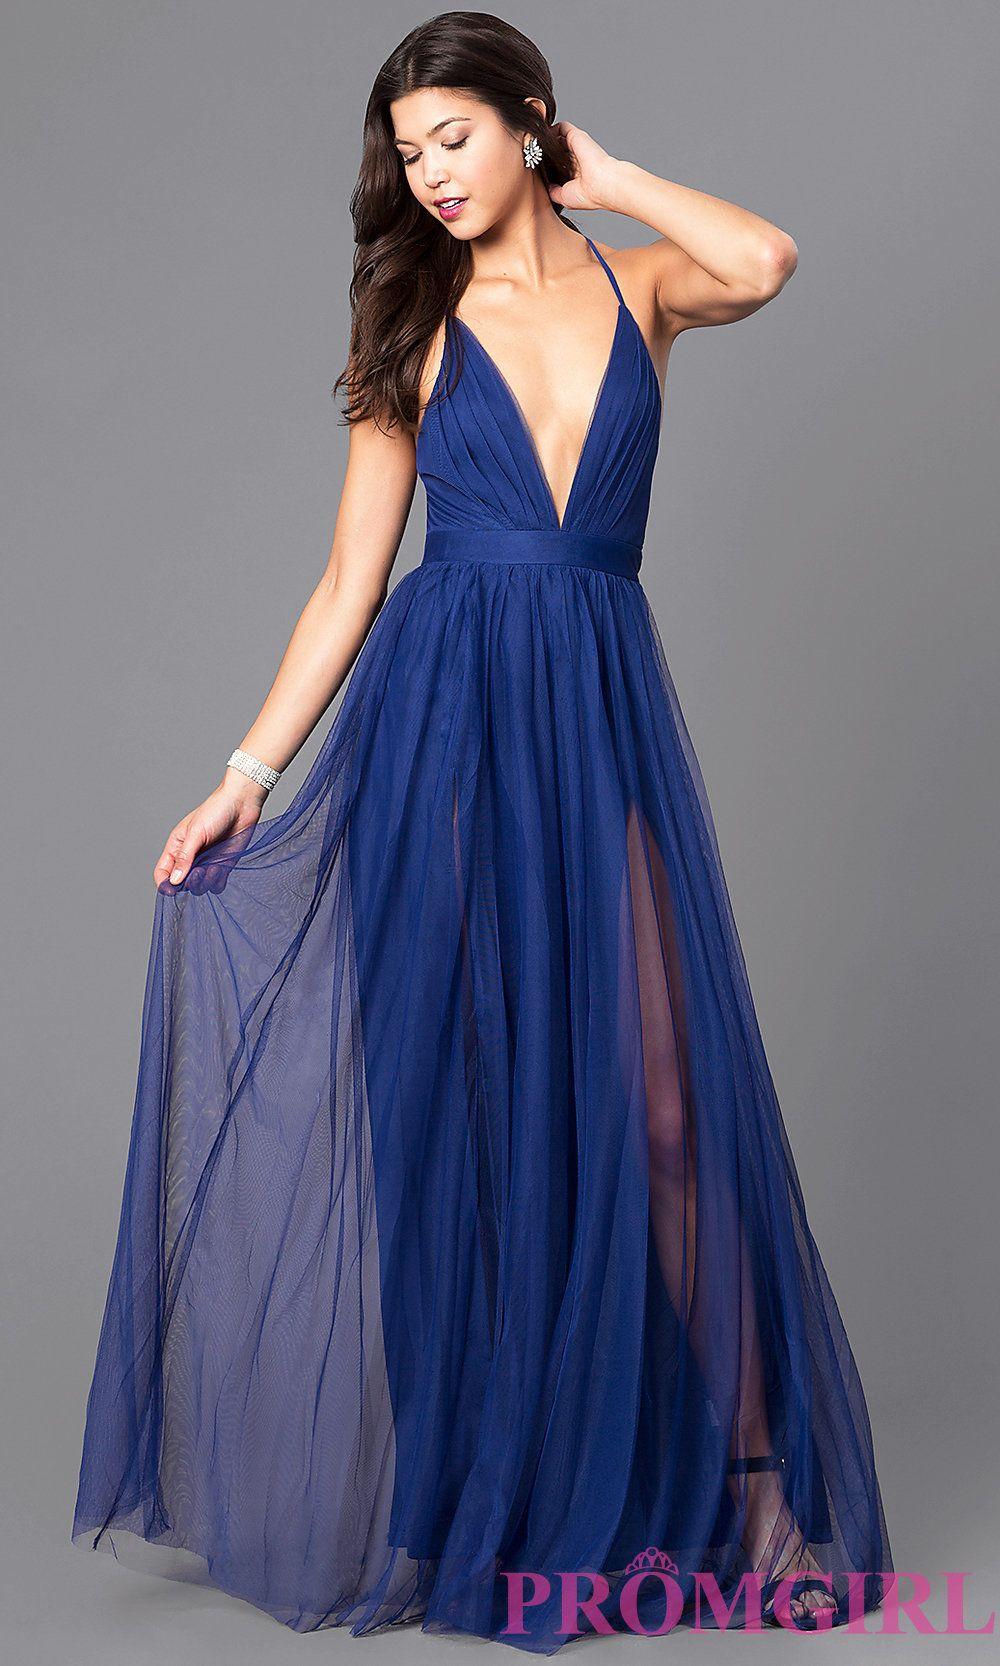 Flowy Cocktail Dresses Formal